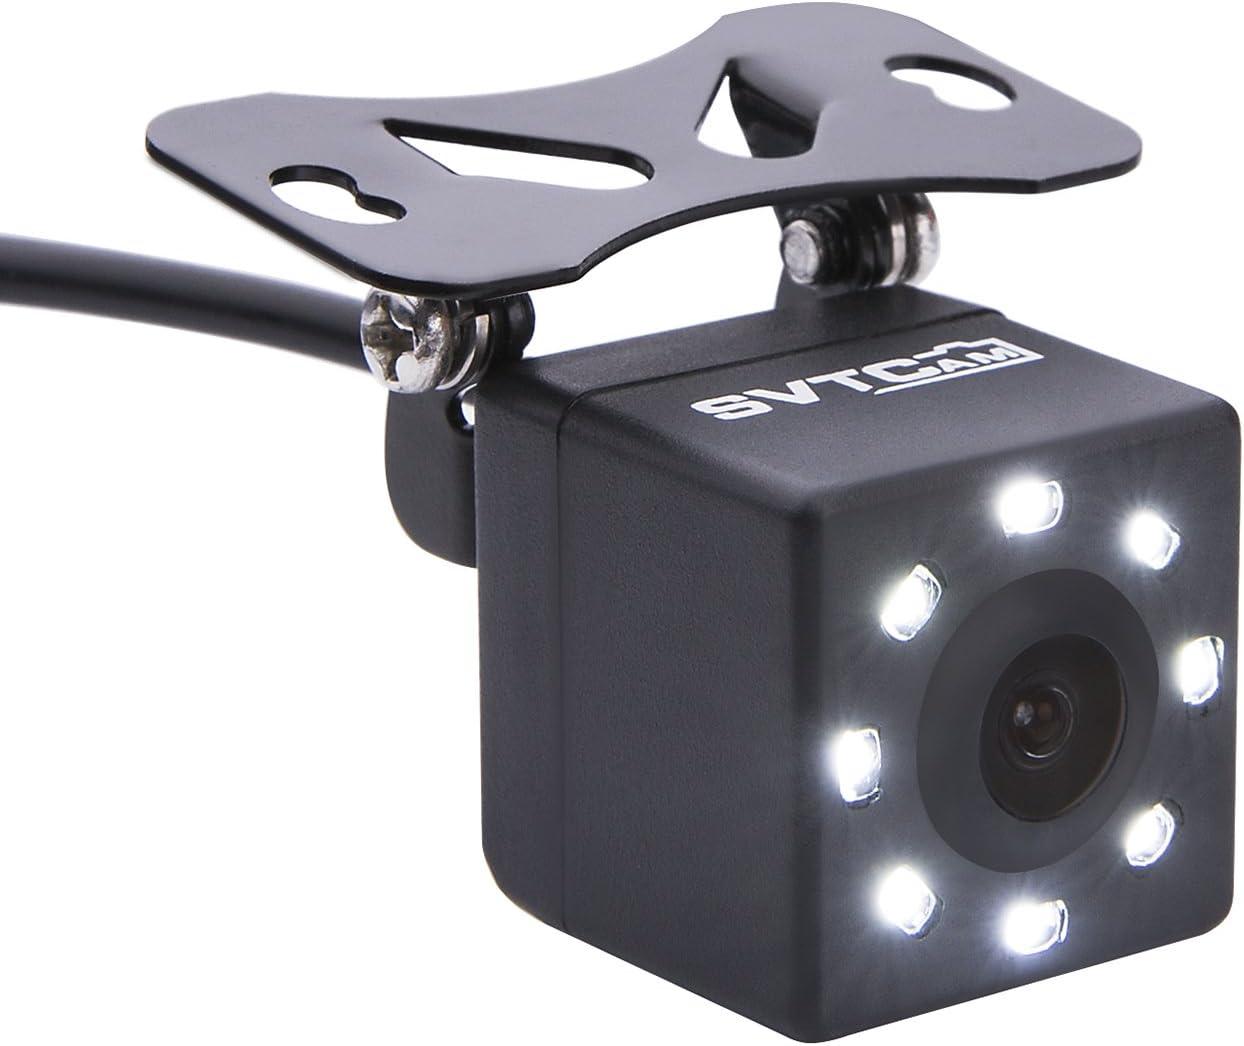 LED Backup Camera, Waterproof High Definition 170 Degree Viewing Angle Rear View Camera